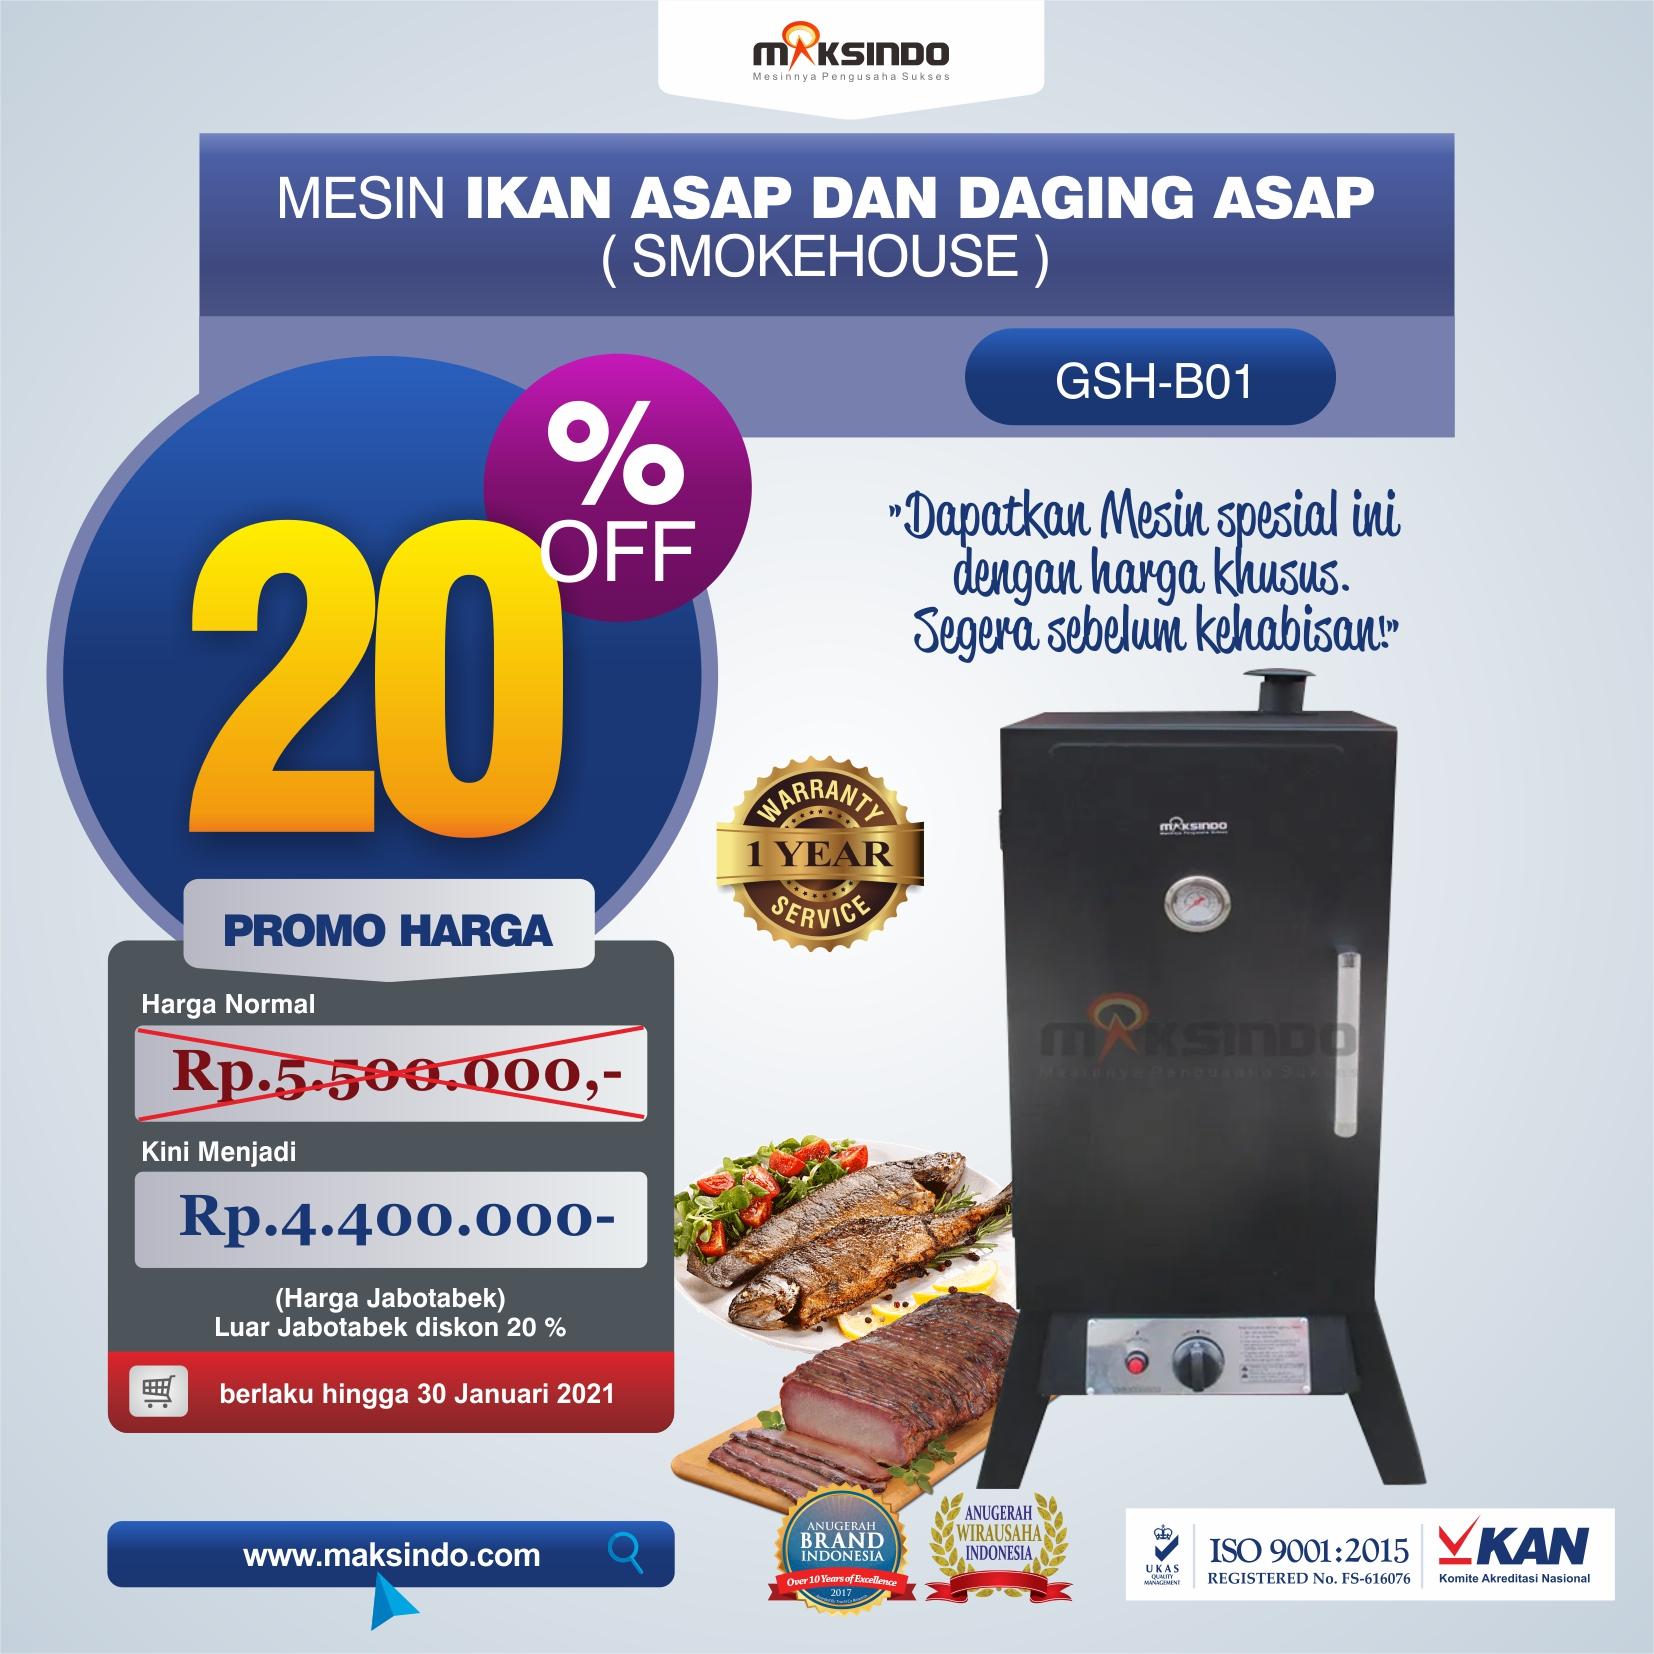 Jual Mesin Smokehouse di Semarang